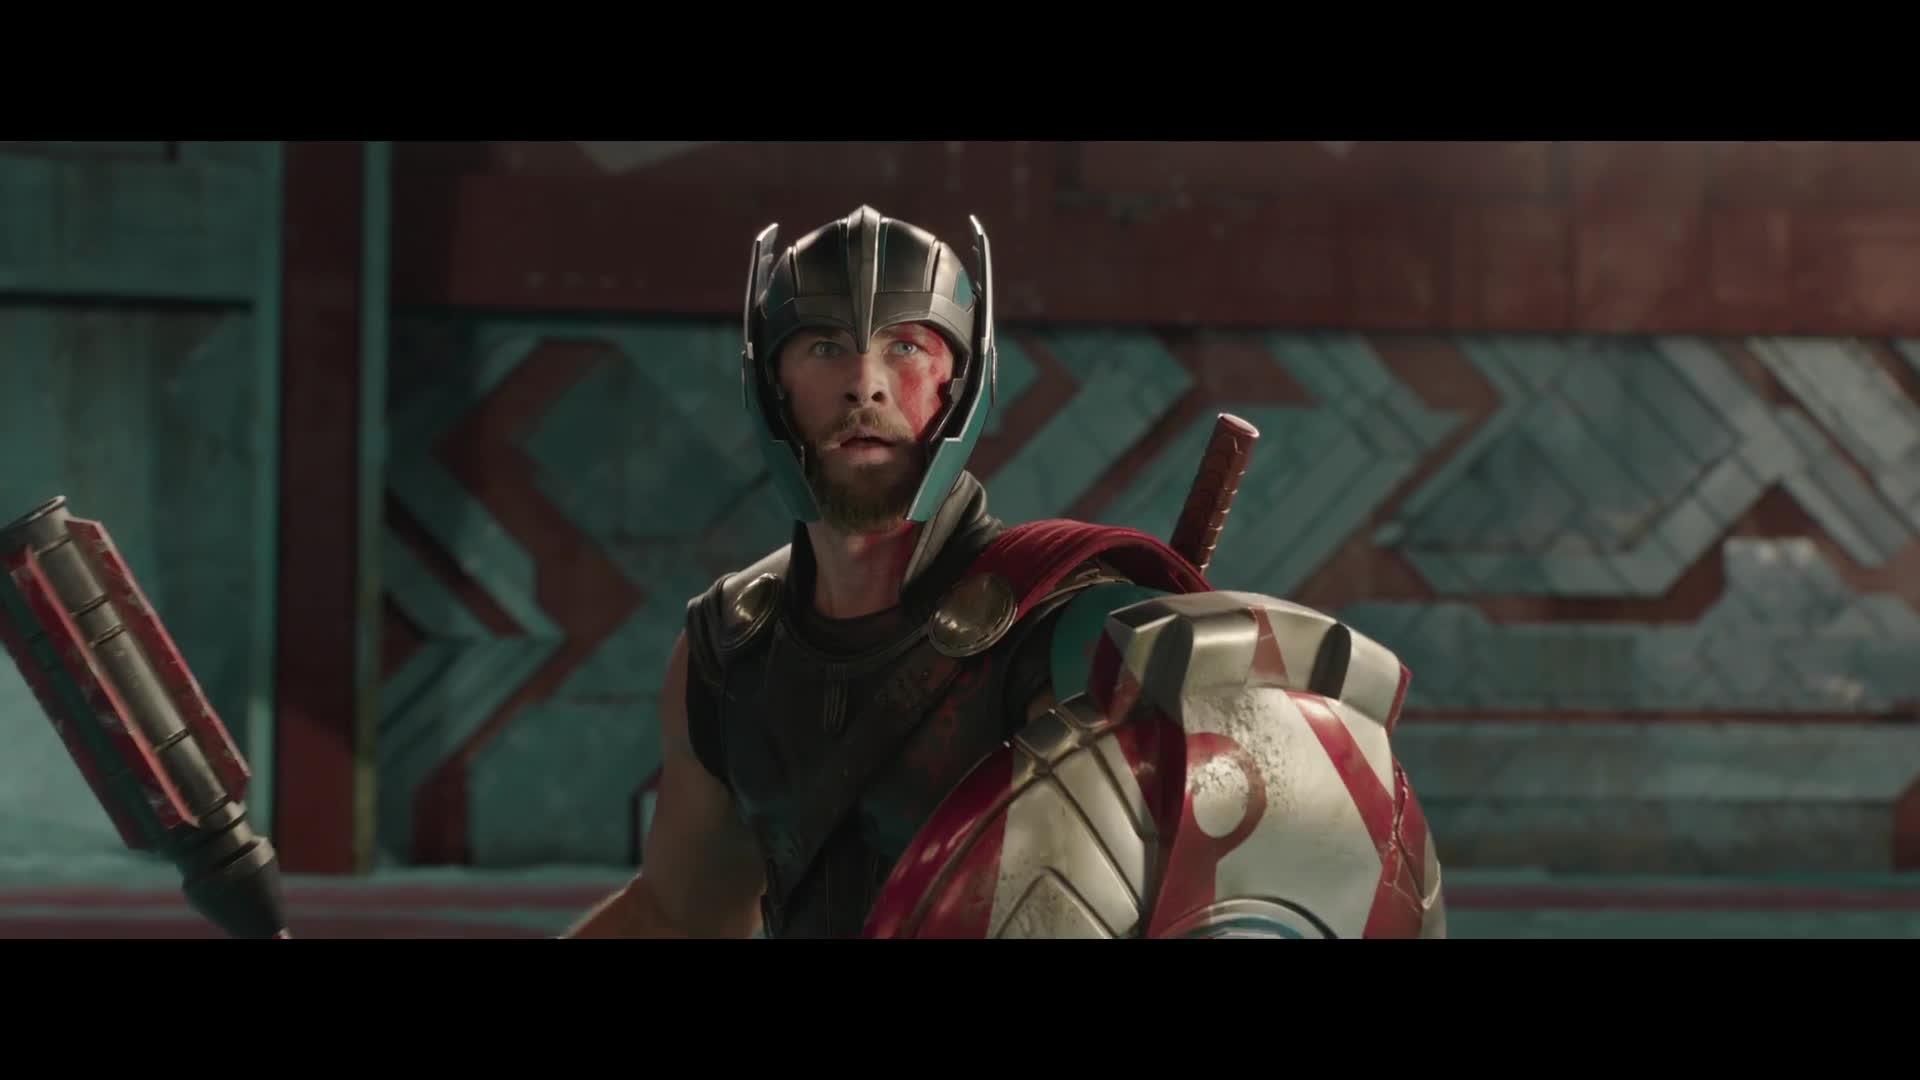 comicbooks, comics, marvelstudios, Thor: Ragnarok Teaser Trailer [HD] GIFs